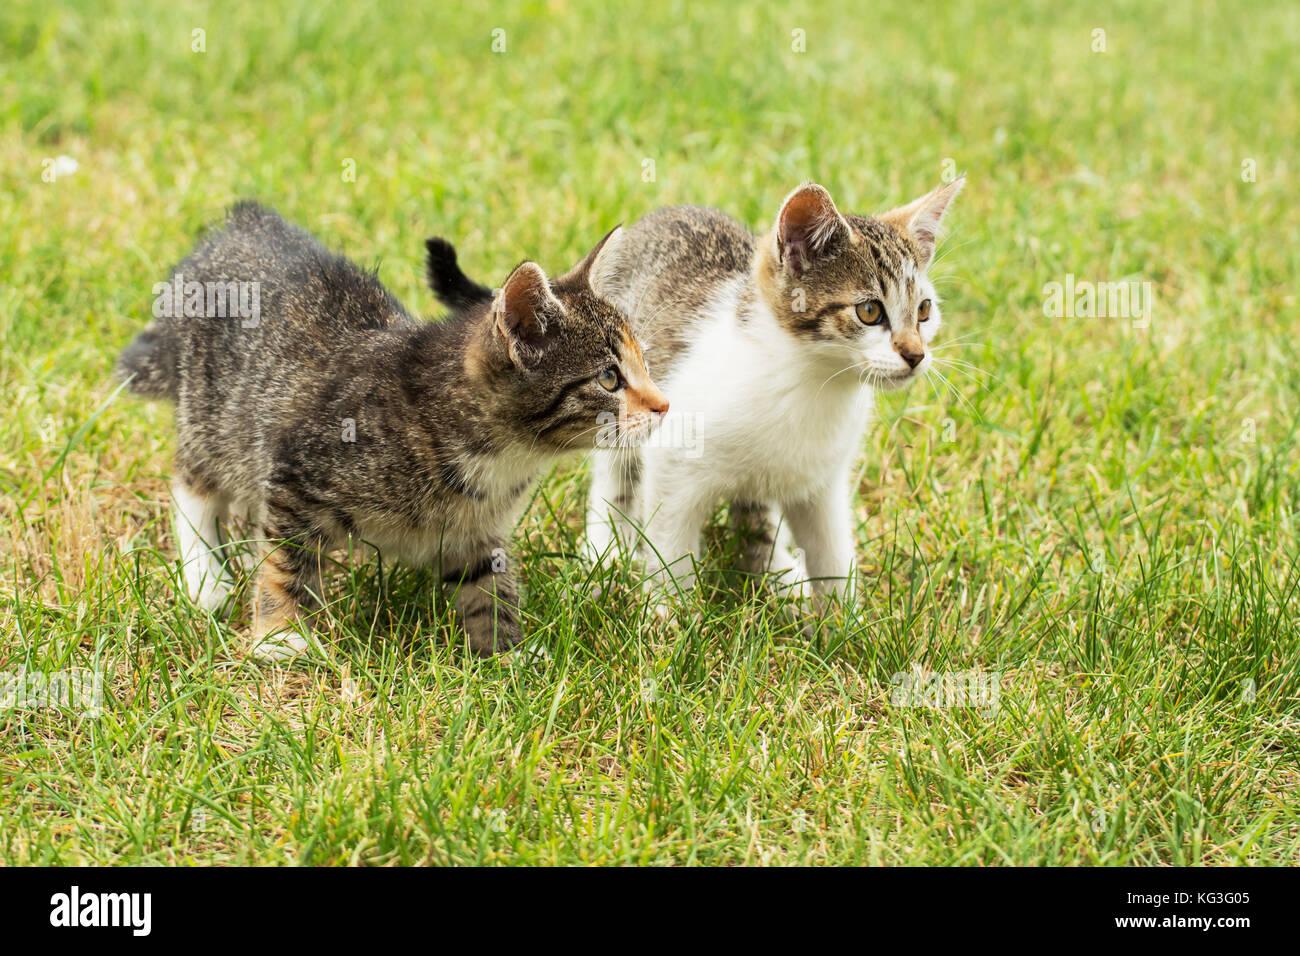 Kittens Tail Stockfotos & Kittens Tail Bilder - Alamy